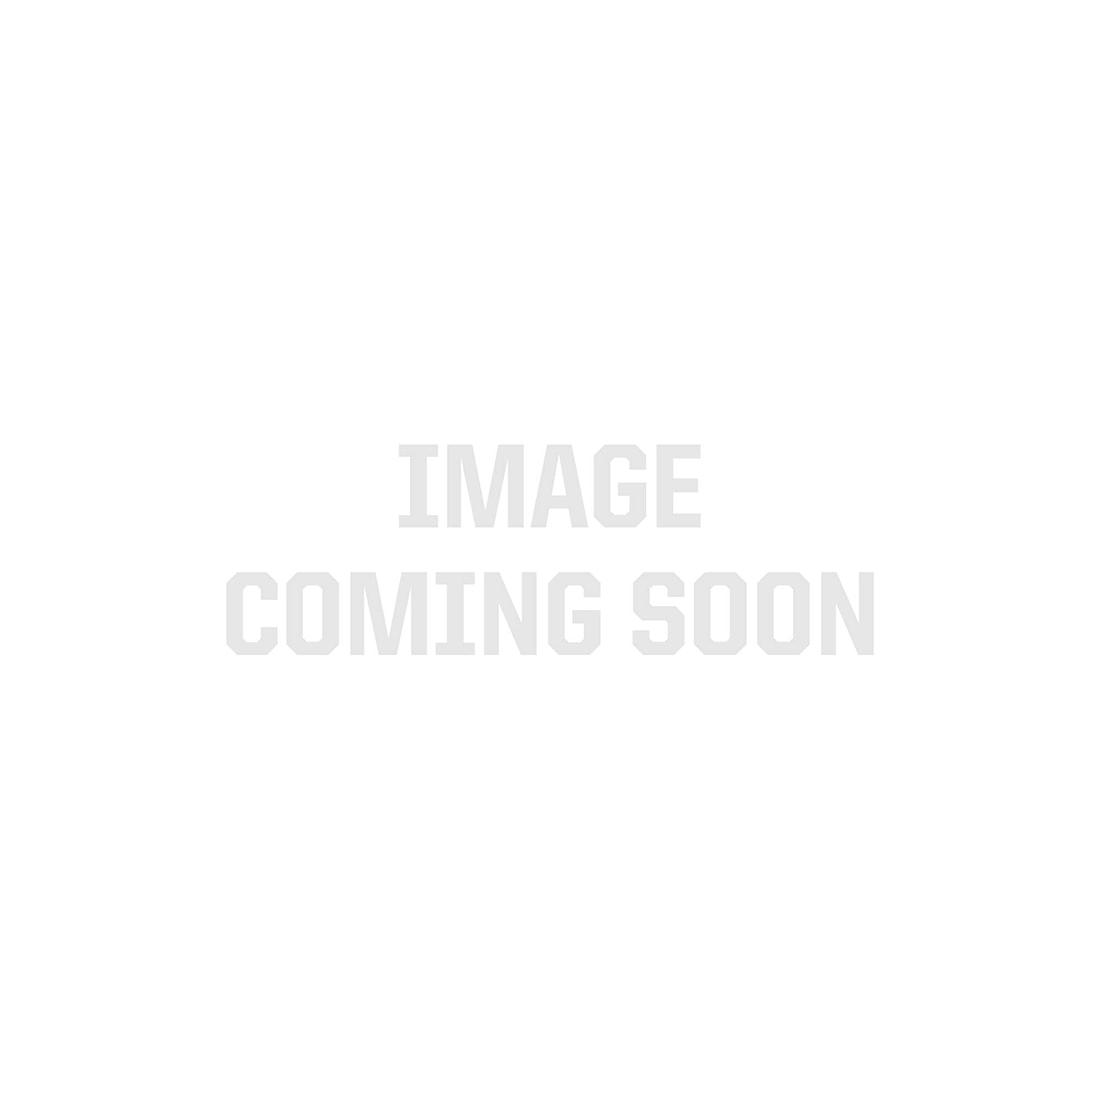 Waterproof RGBA 4-in-1 5050 CurrentControl LED Strip Light, 72/m, 12mm wide, Sample Kit